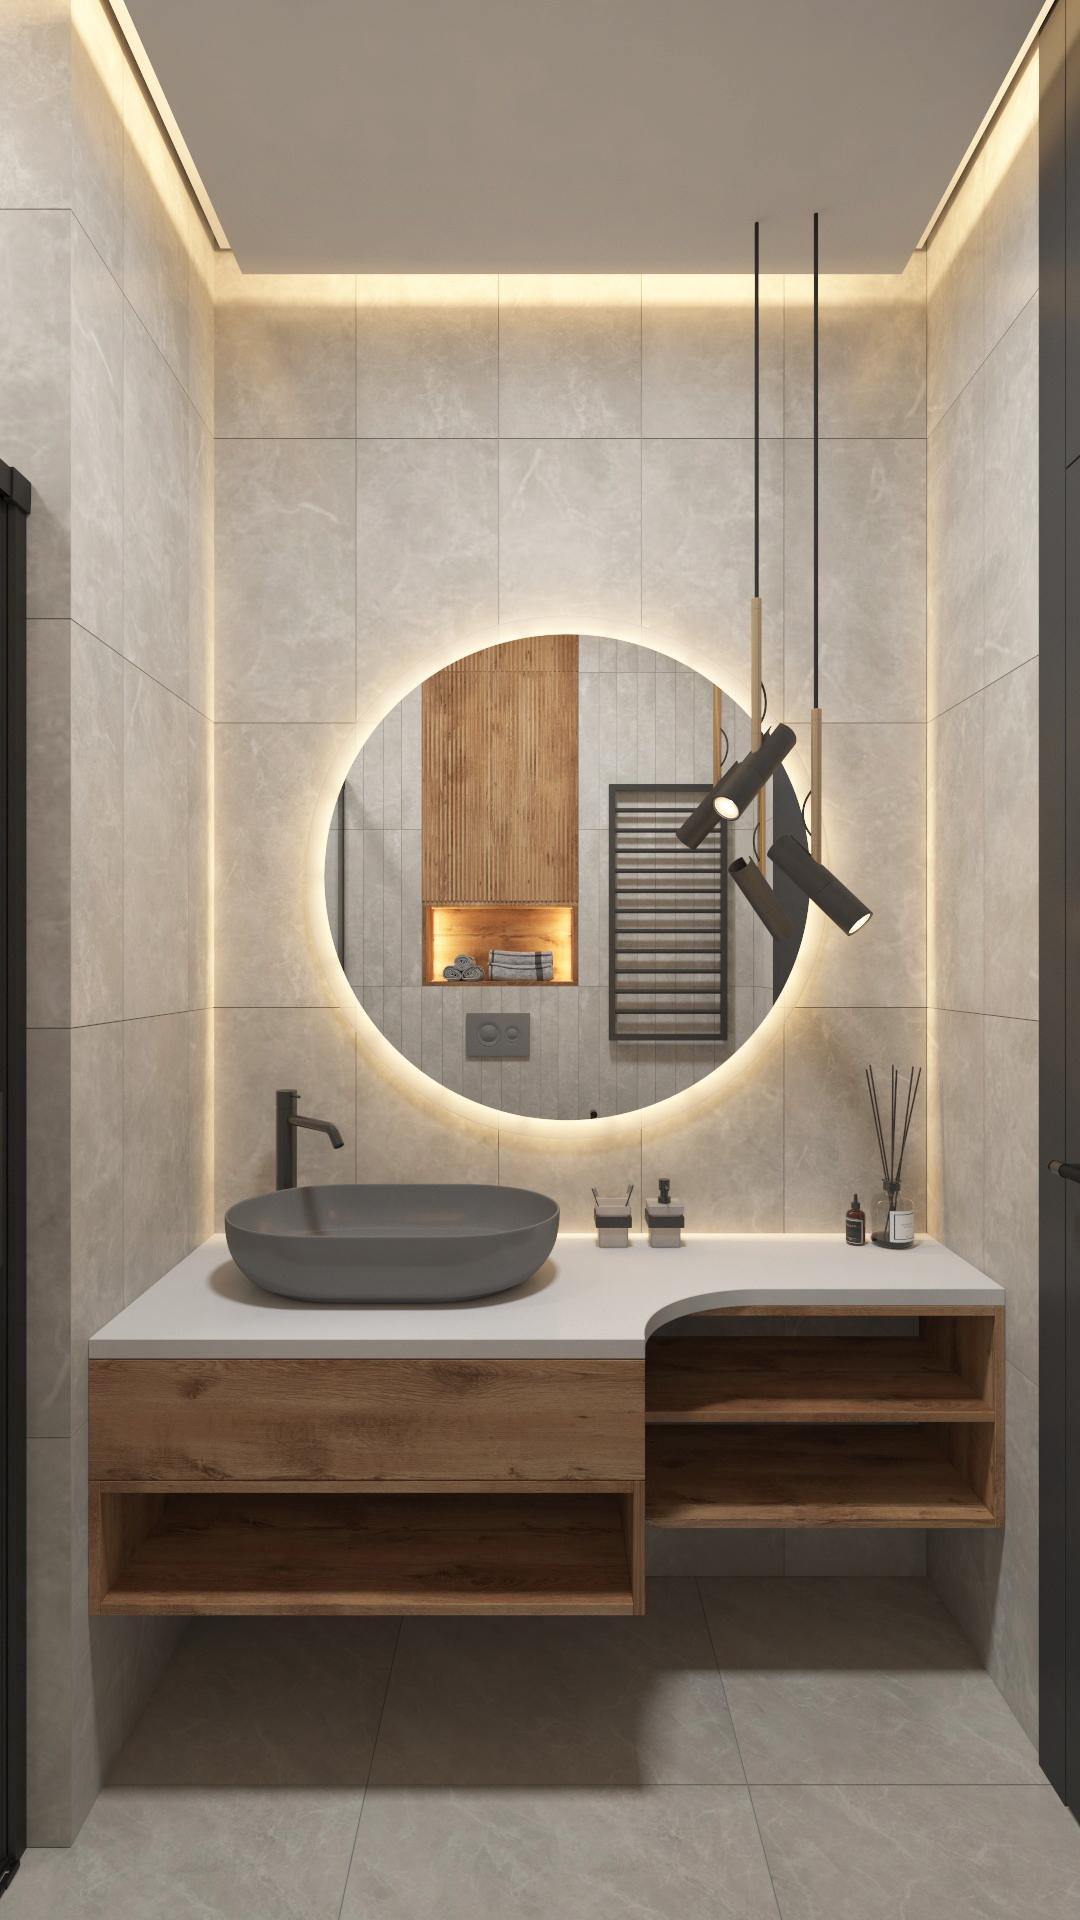 LuxeHome_Masterbathroom_001